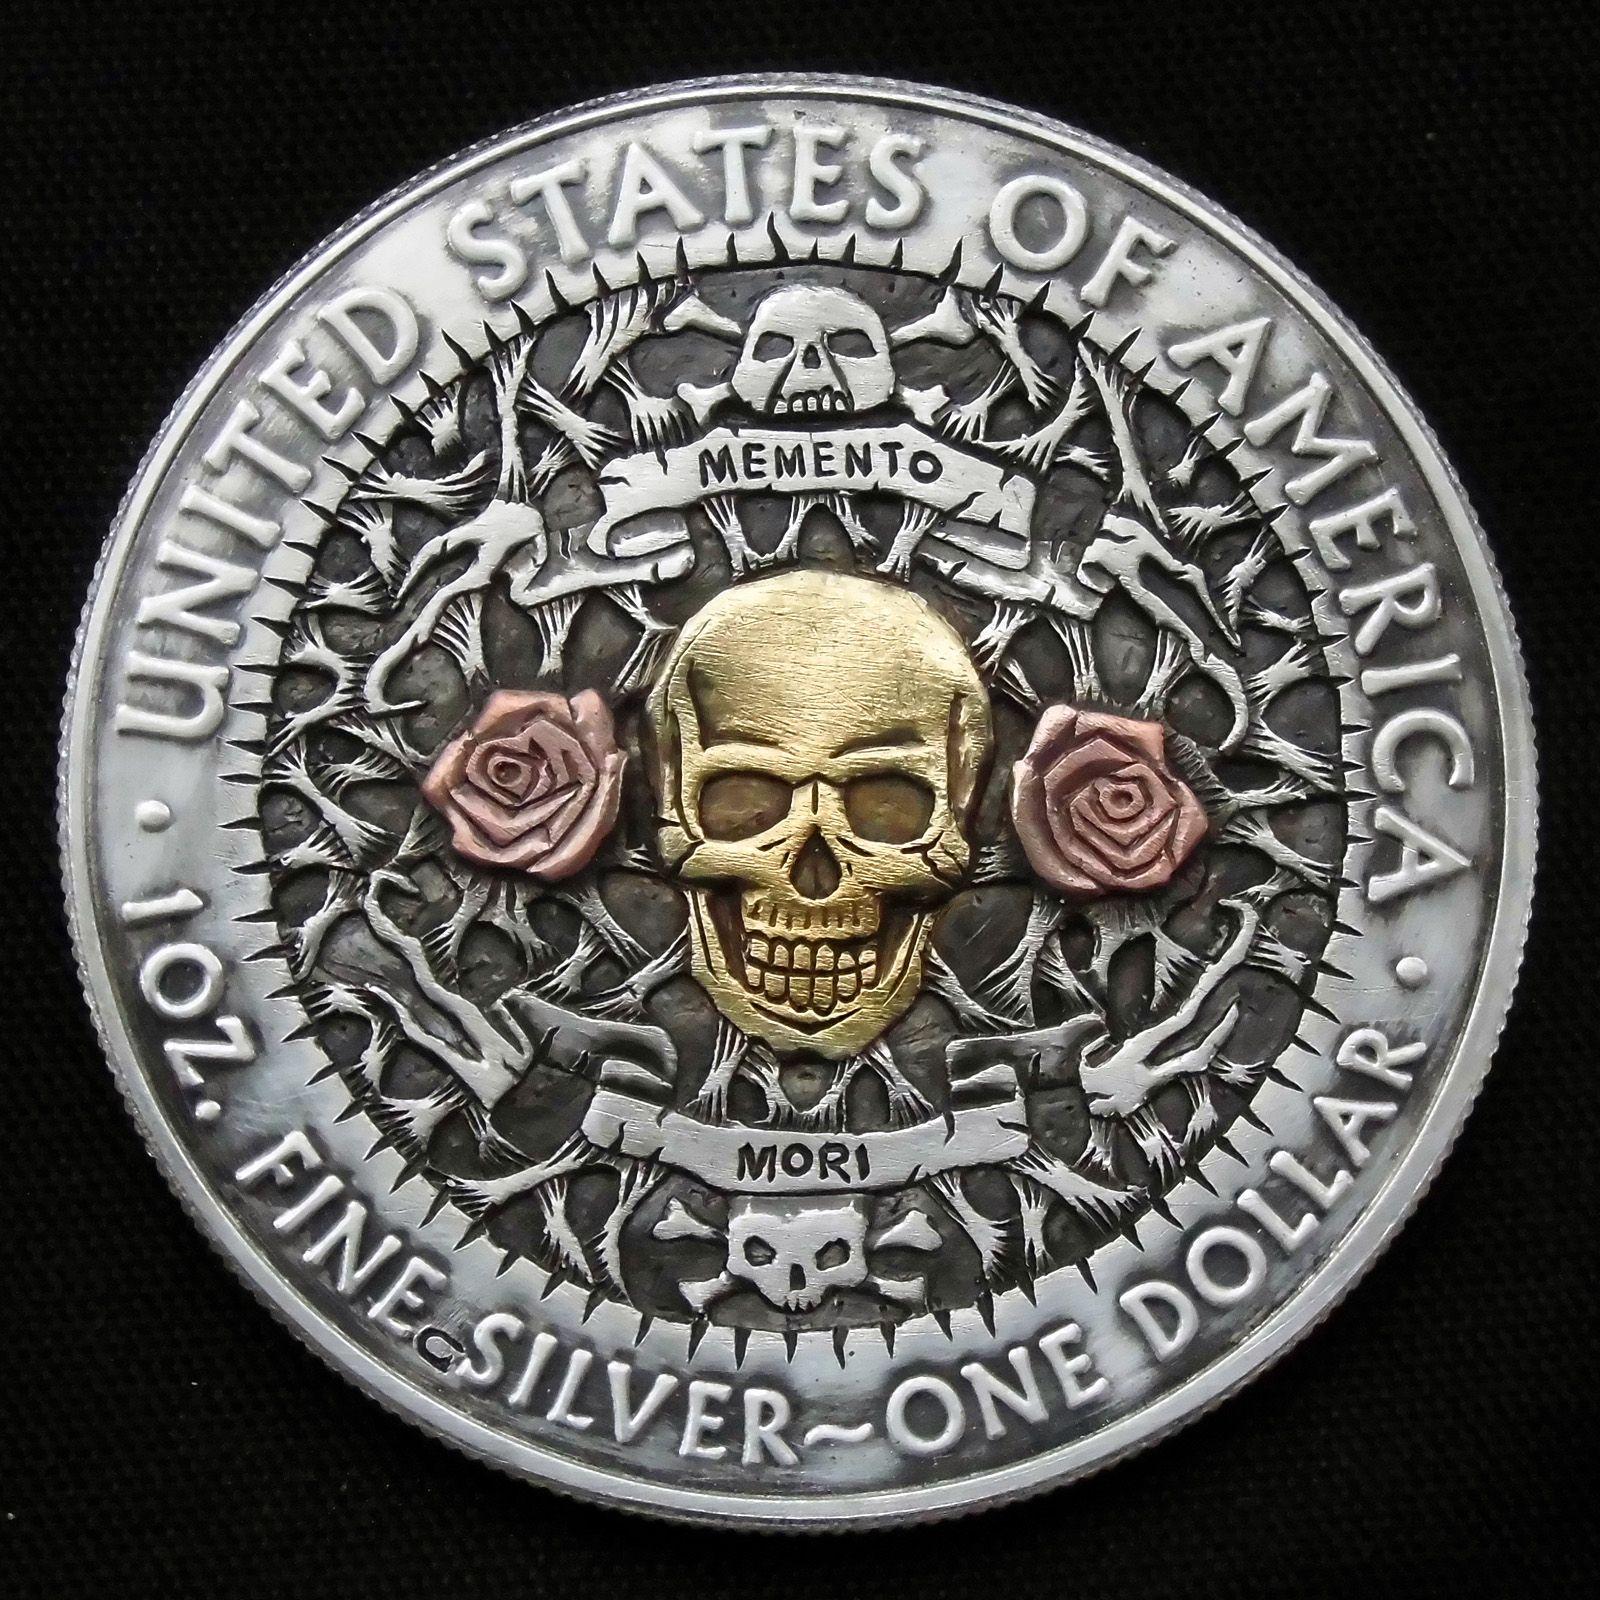 Memento Mori 1 Oz Fine Silver One Dollar Hobo Nickel Style Hand Carved Hobo Nickel Coin Art Custom Coins